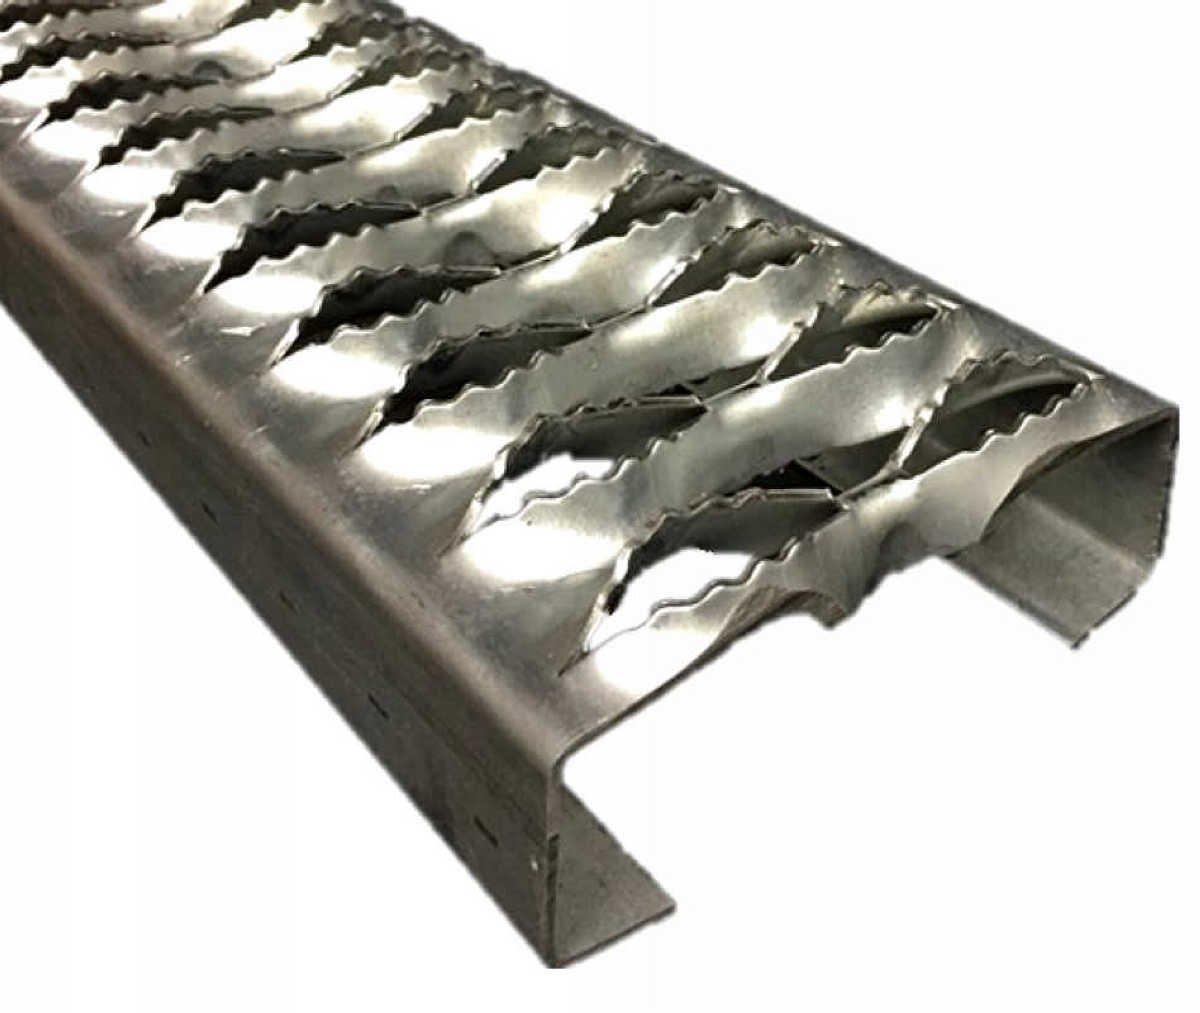 3322012-48 Grip Strut Channel Aluminum 2-Diamond Plank Safety Grating, 48'' Length x 4-3/4'' Width x 2'' Depth